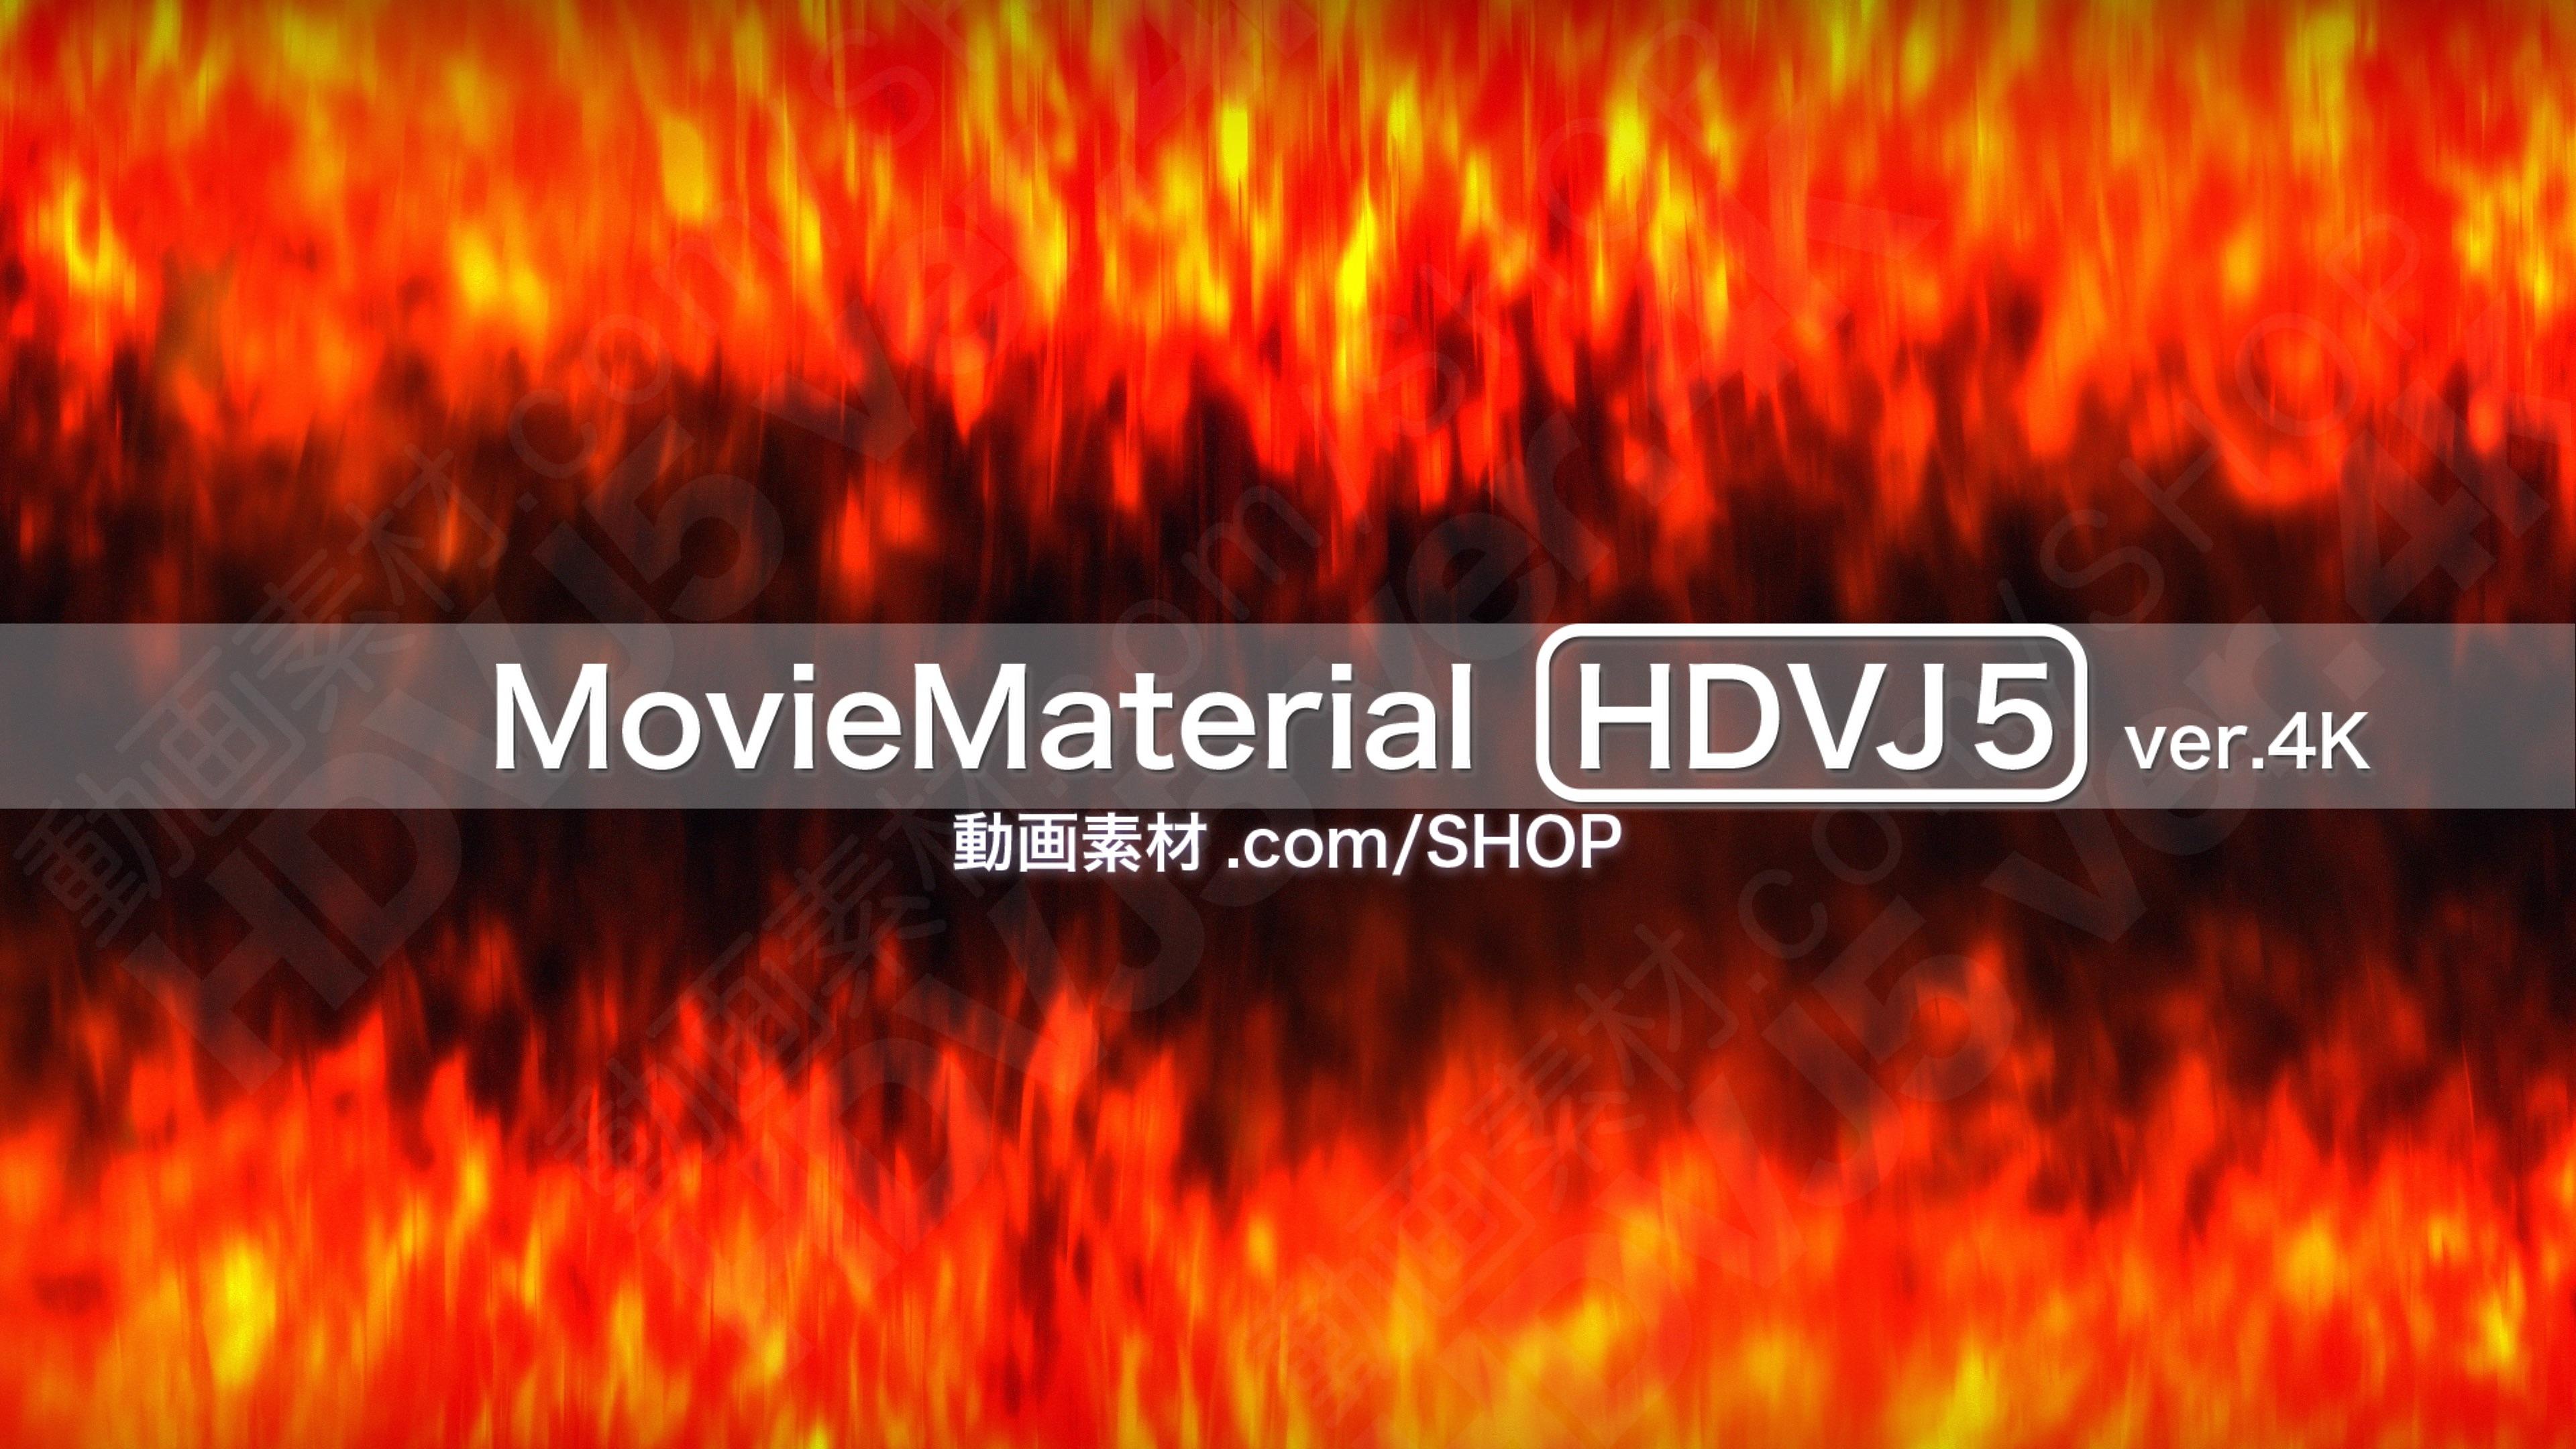 4K2Kループ動画素材集第5段【MovieMaterial HDVJ5 ver.4K】ロイヤリティフリー(著作権使用料無料)1